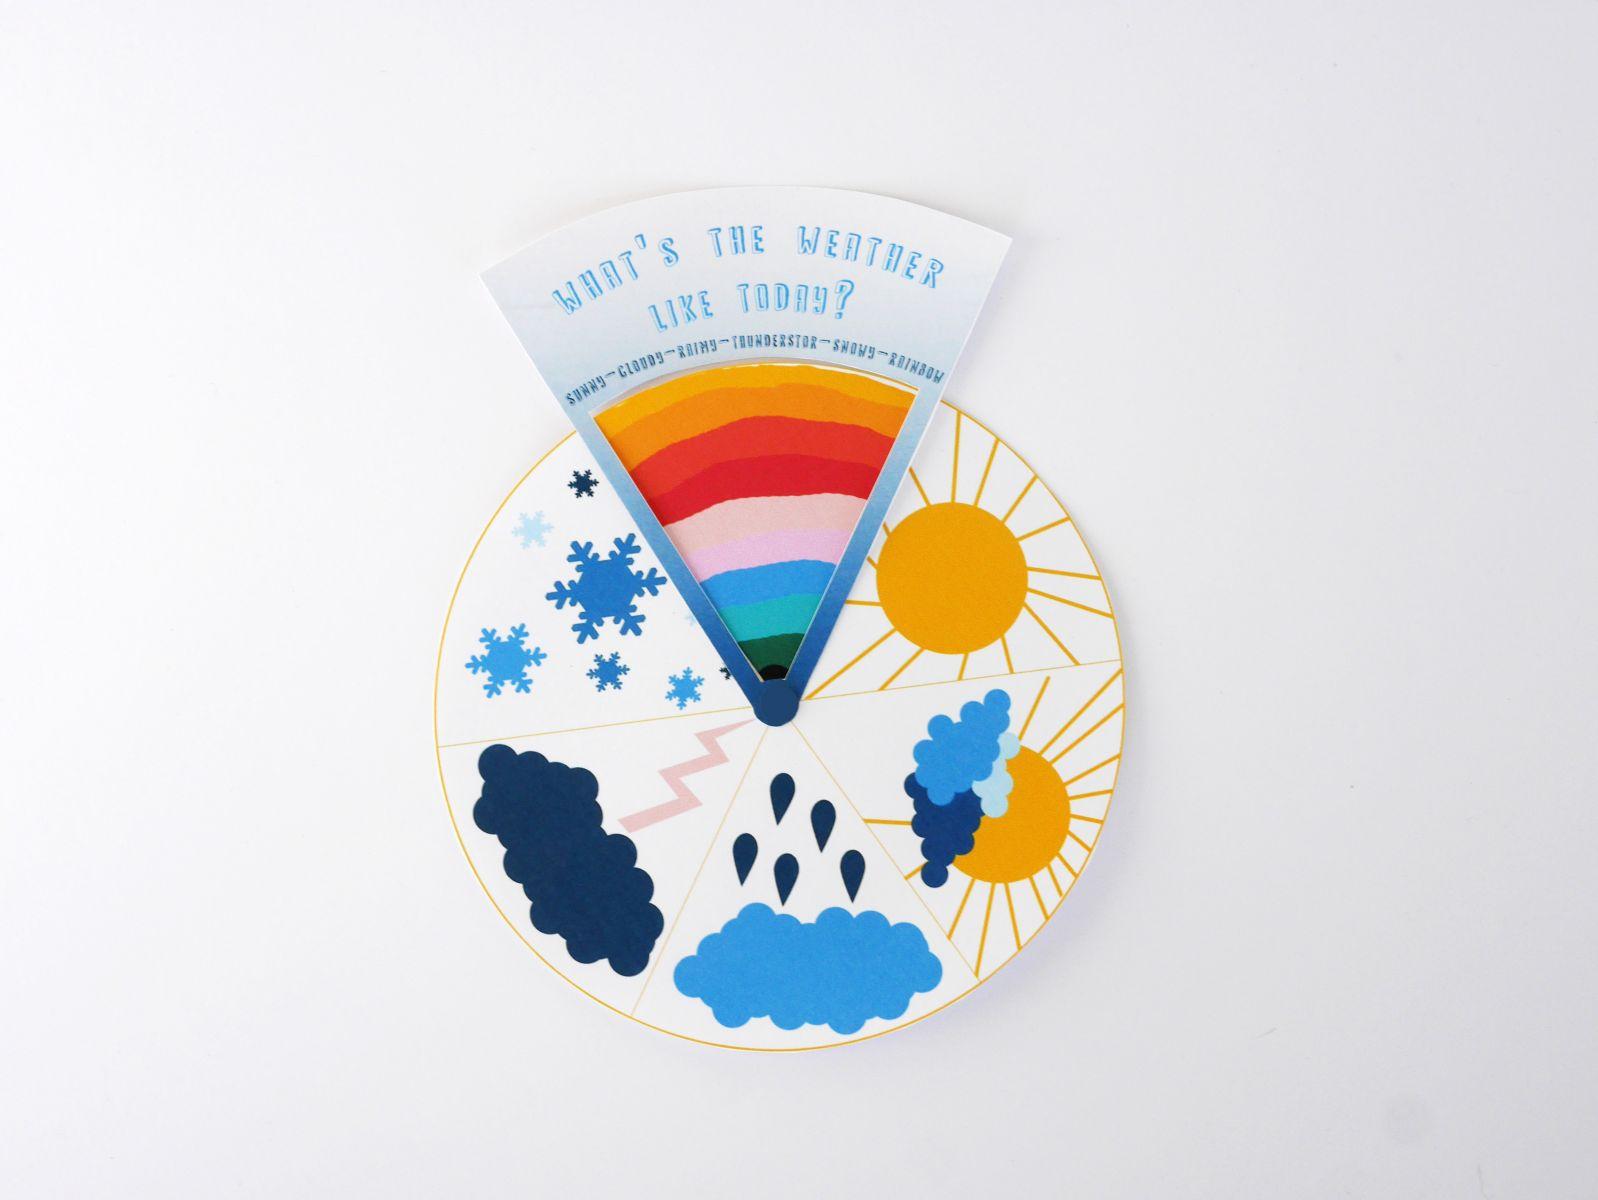 Hello Wonderful weather wheel